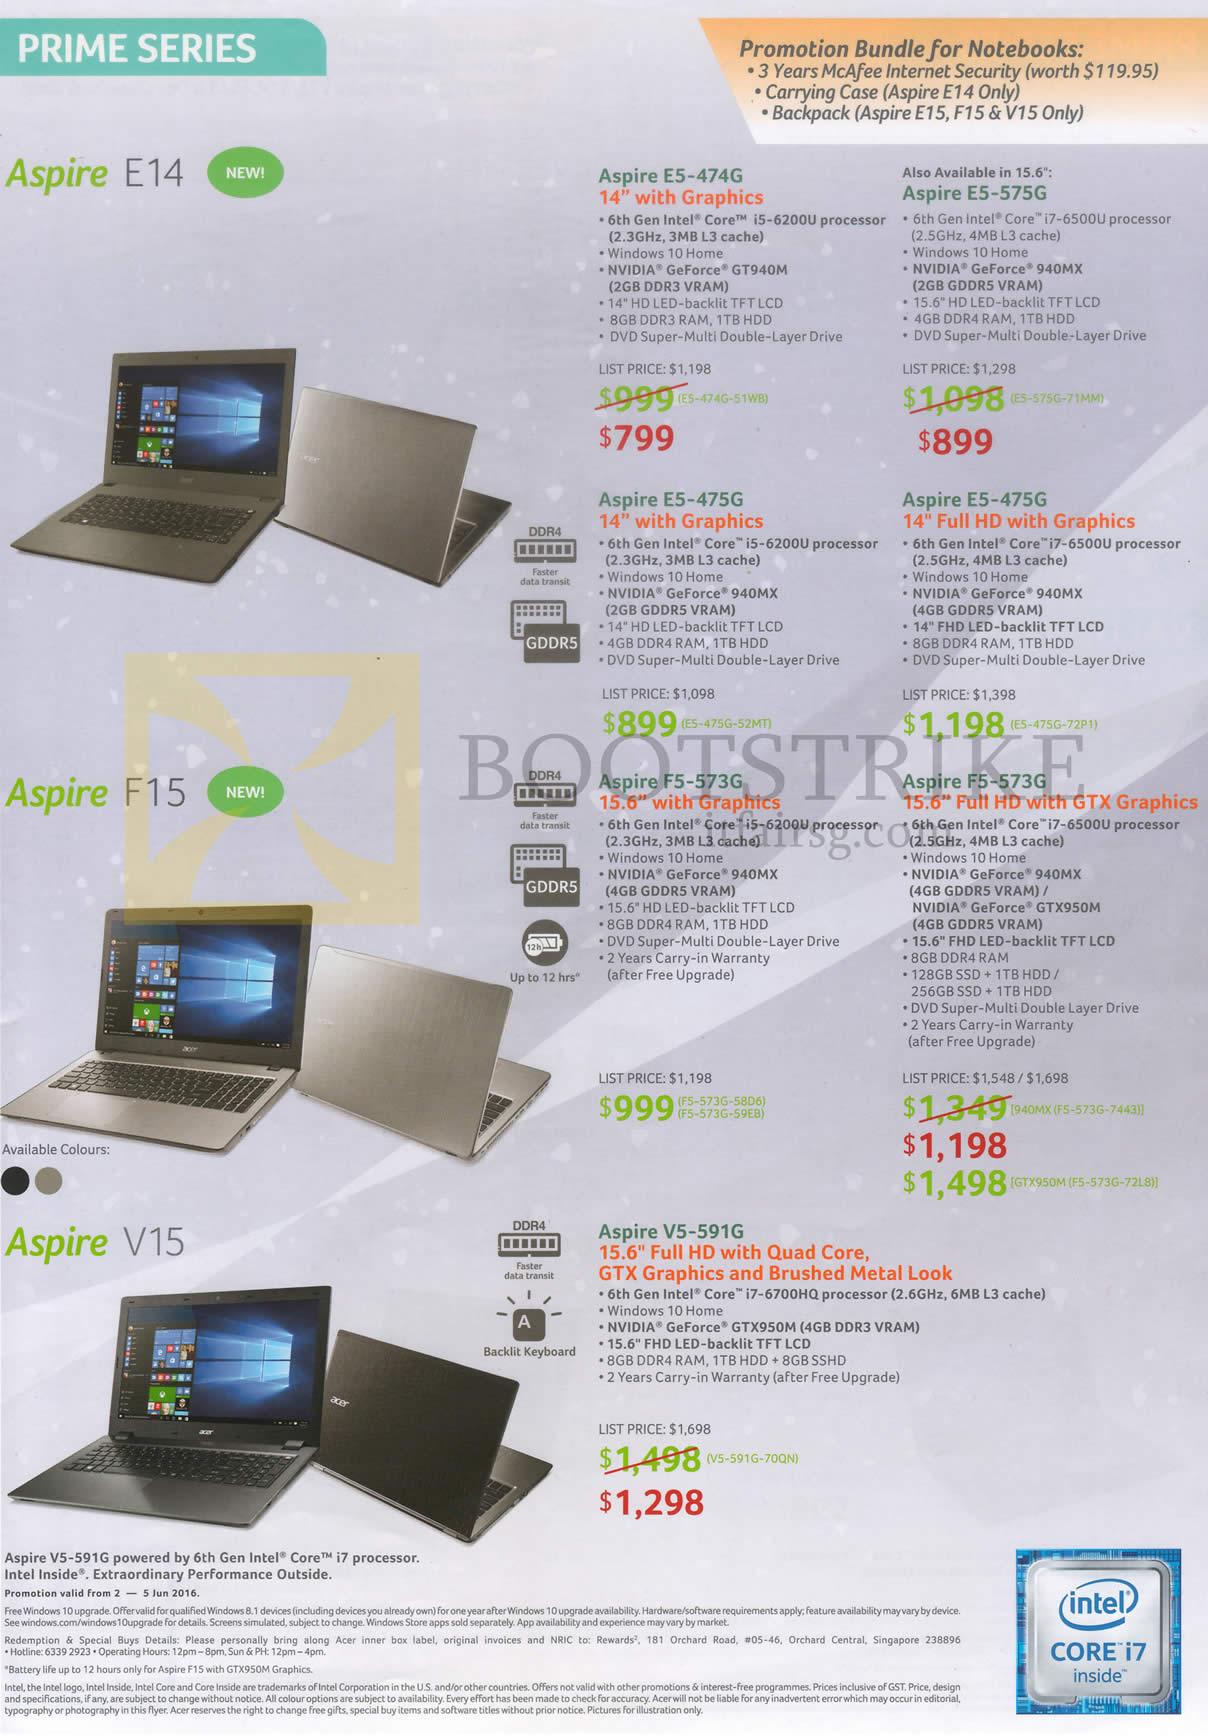 PC SHOW 2016 price list image brochure of Acer Notebooks Prime Series E14 F15 V15 Aspire E5-474G, 475G, 575G, 573G, V5-591G